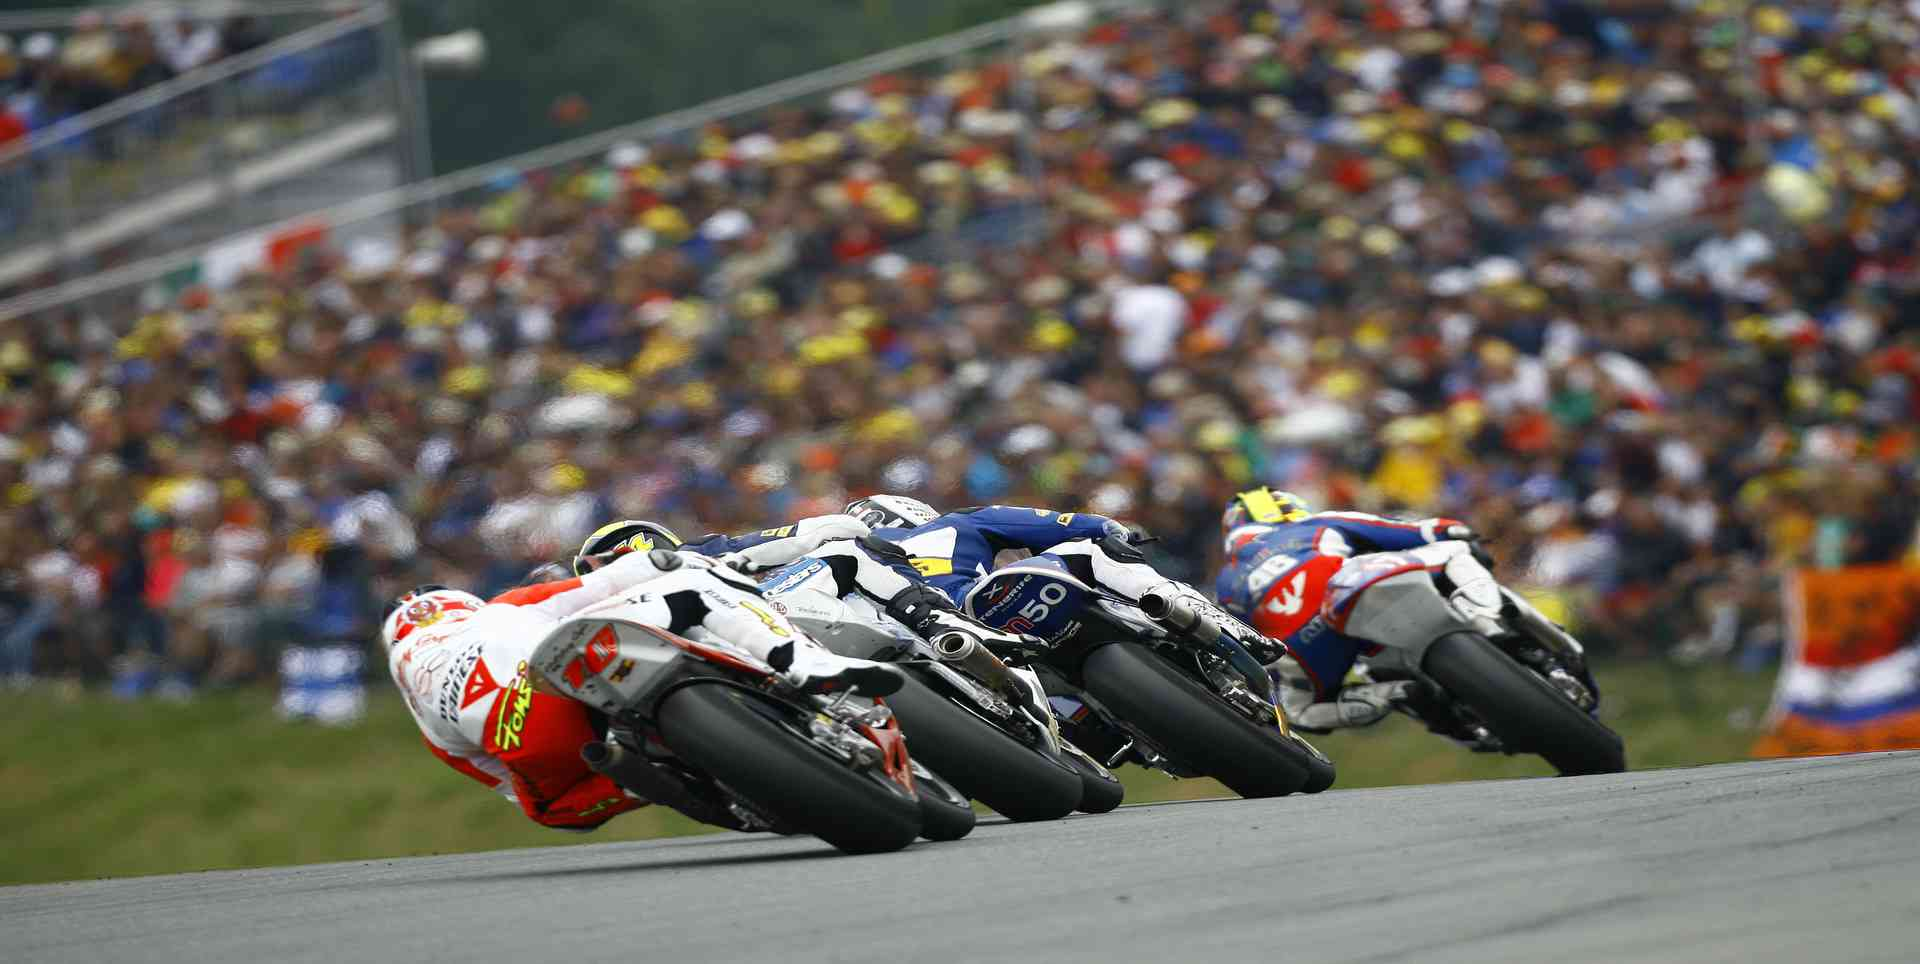 French Grand Prix Moto Race 2016 Live